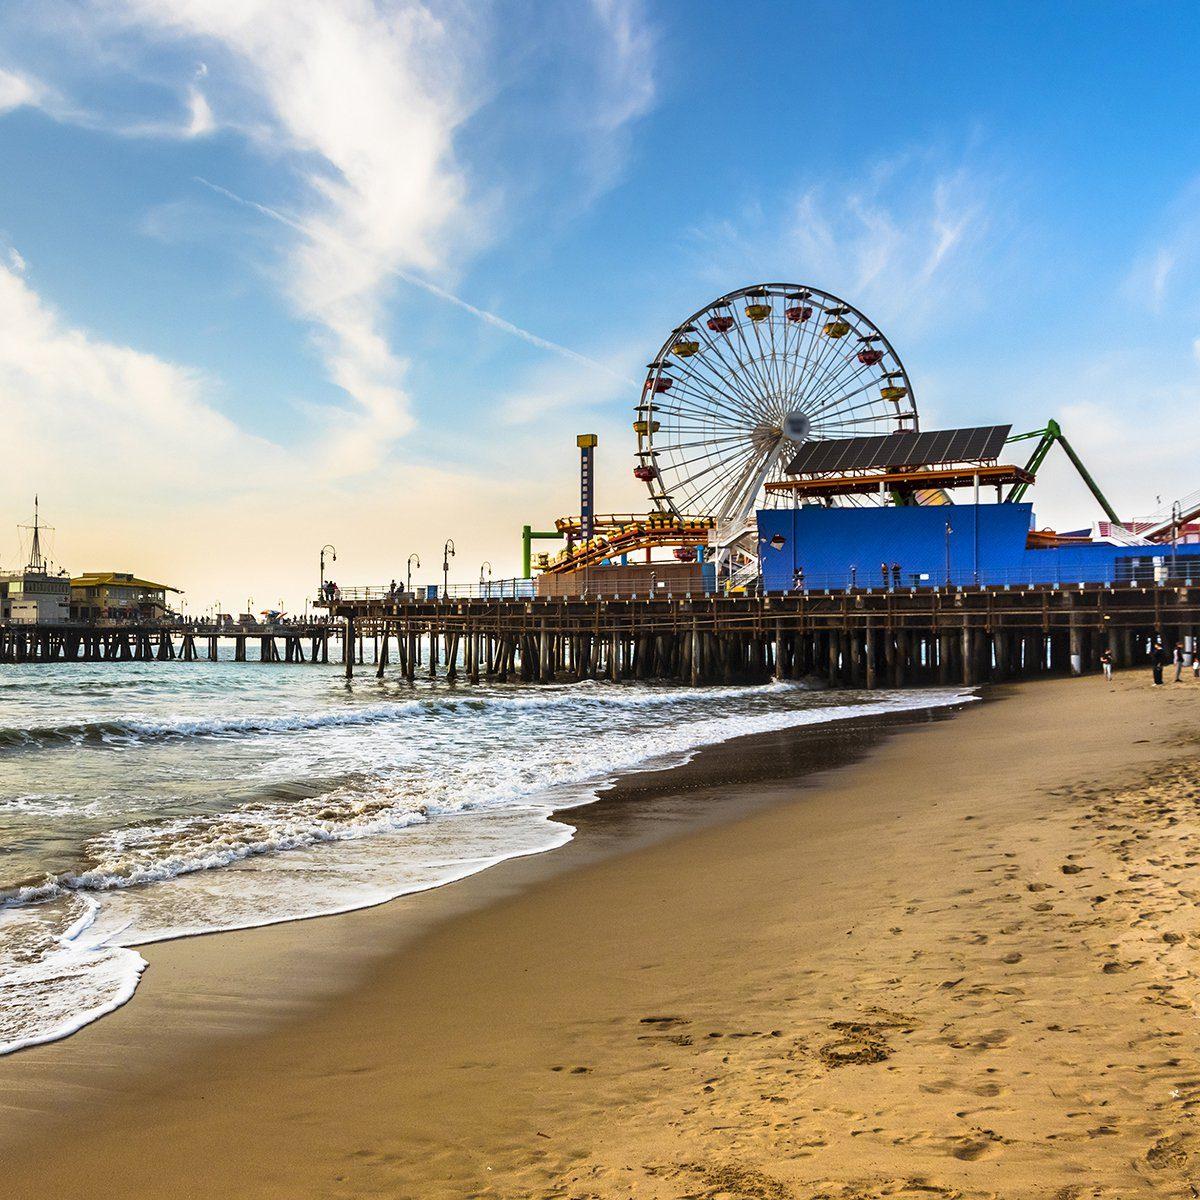 early morning winter Santa Monica pier beach sunny day